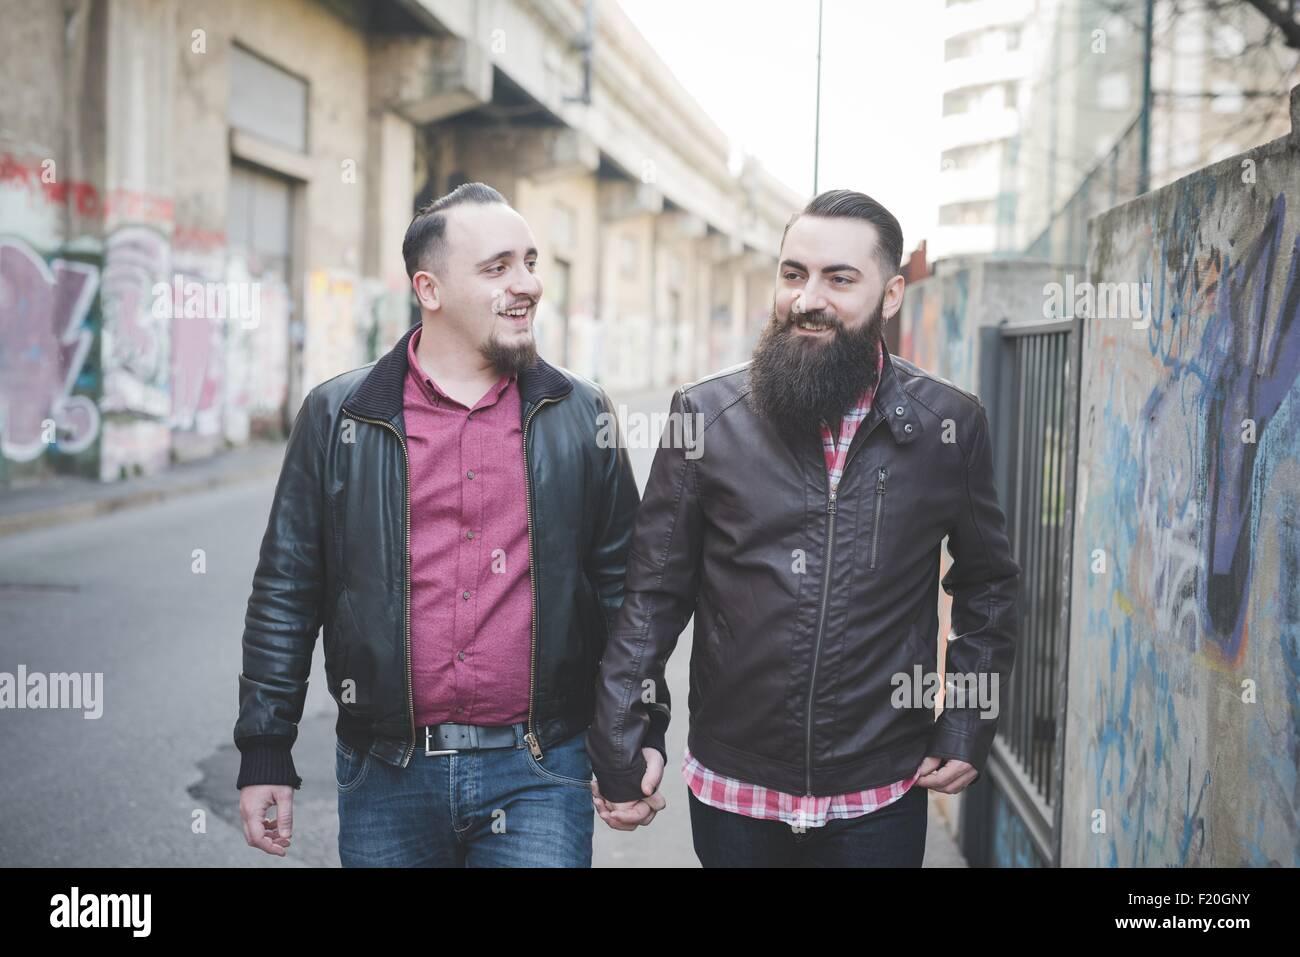 Gay couple walking on street - Stock Image